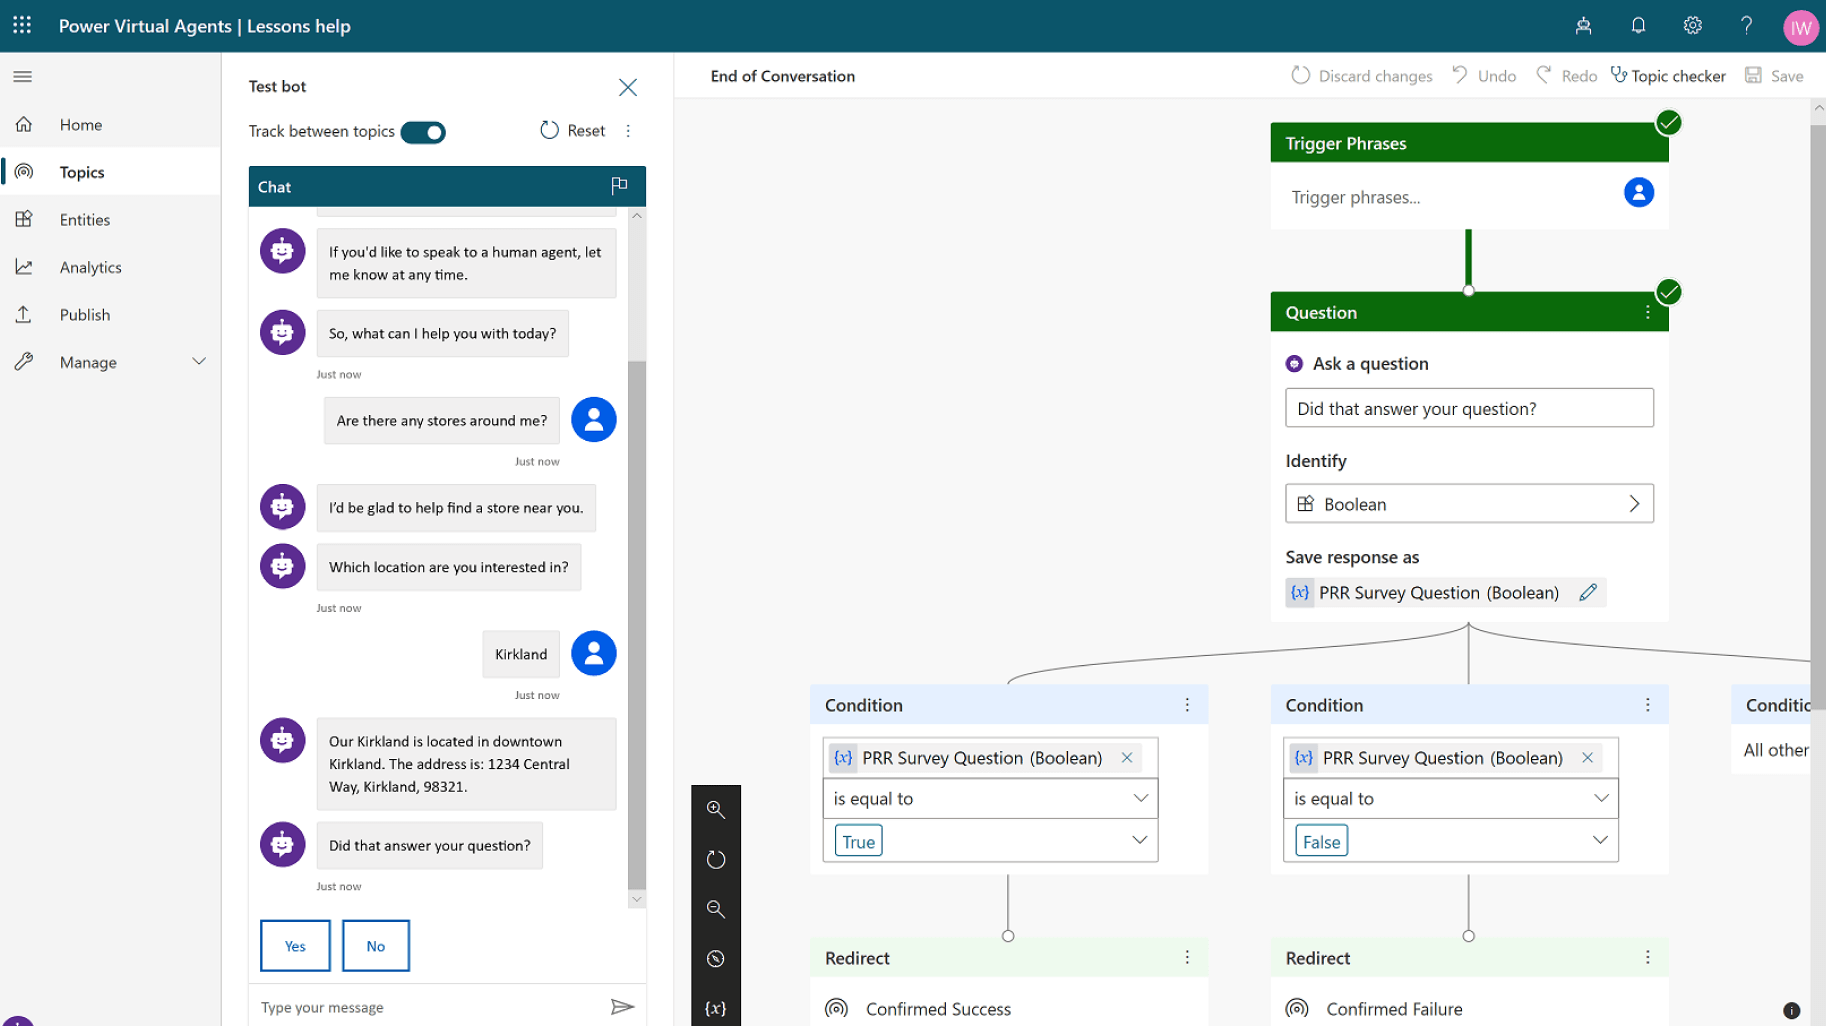 Power Virtual Agent Screenshot